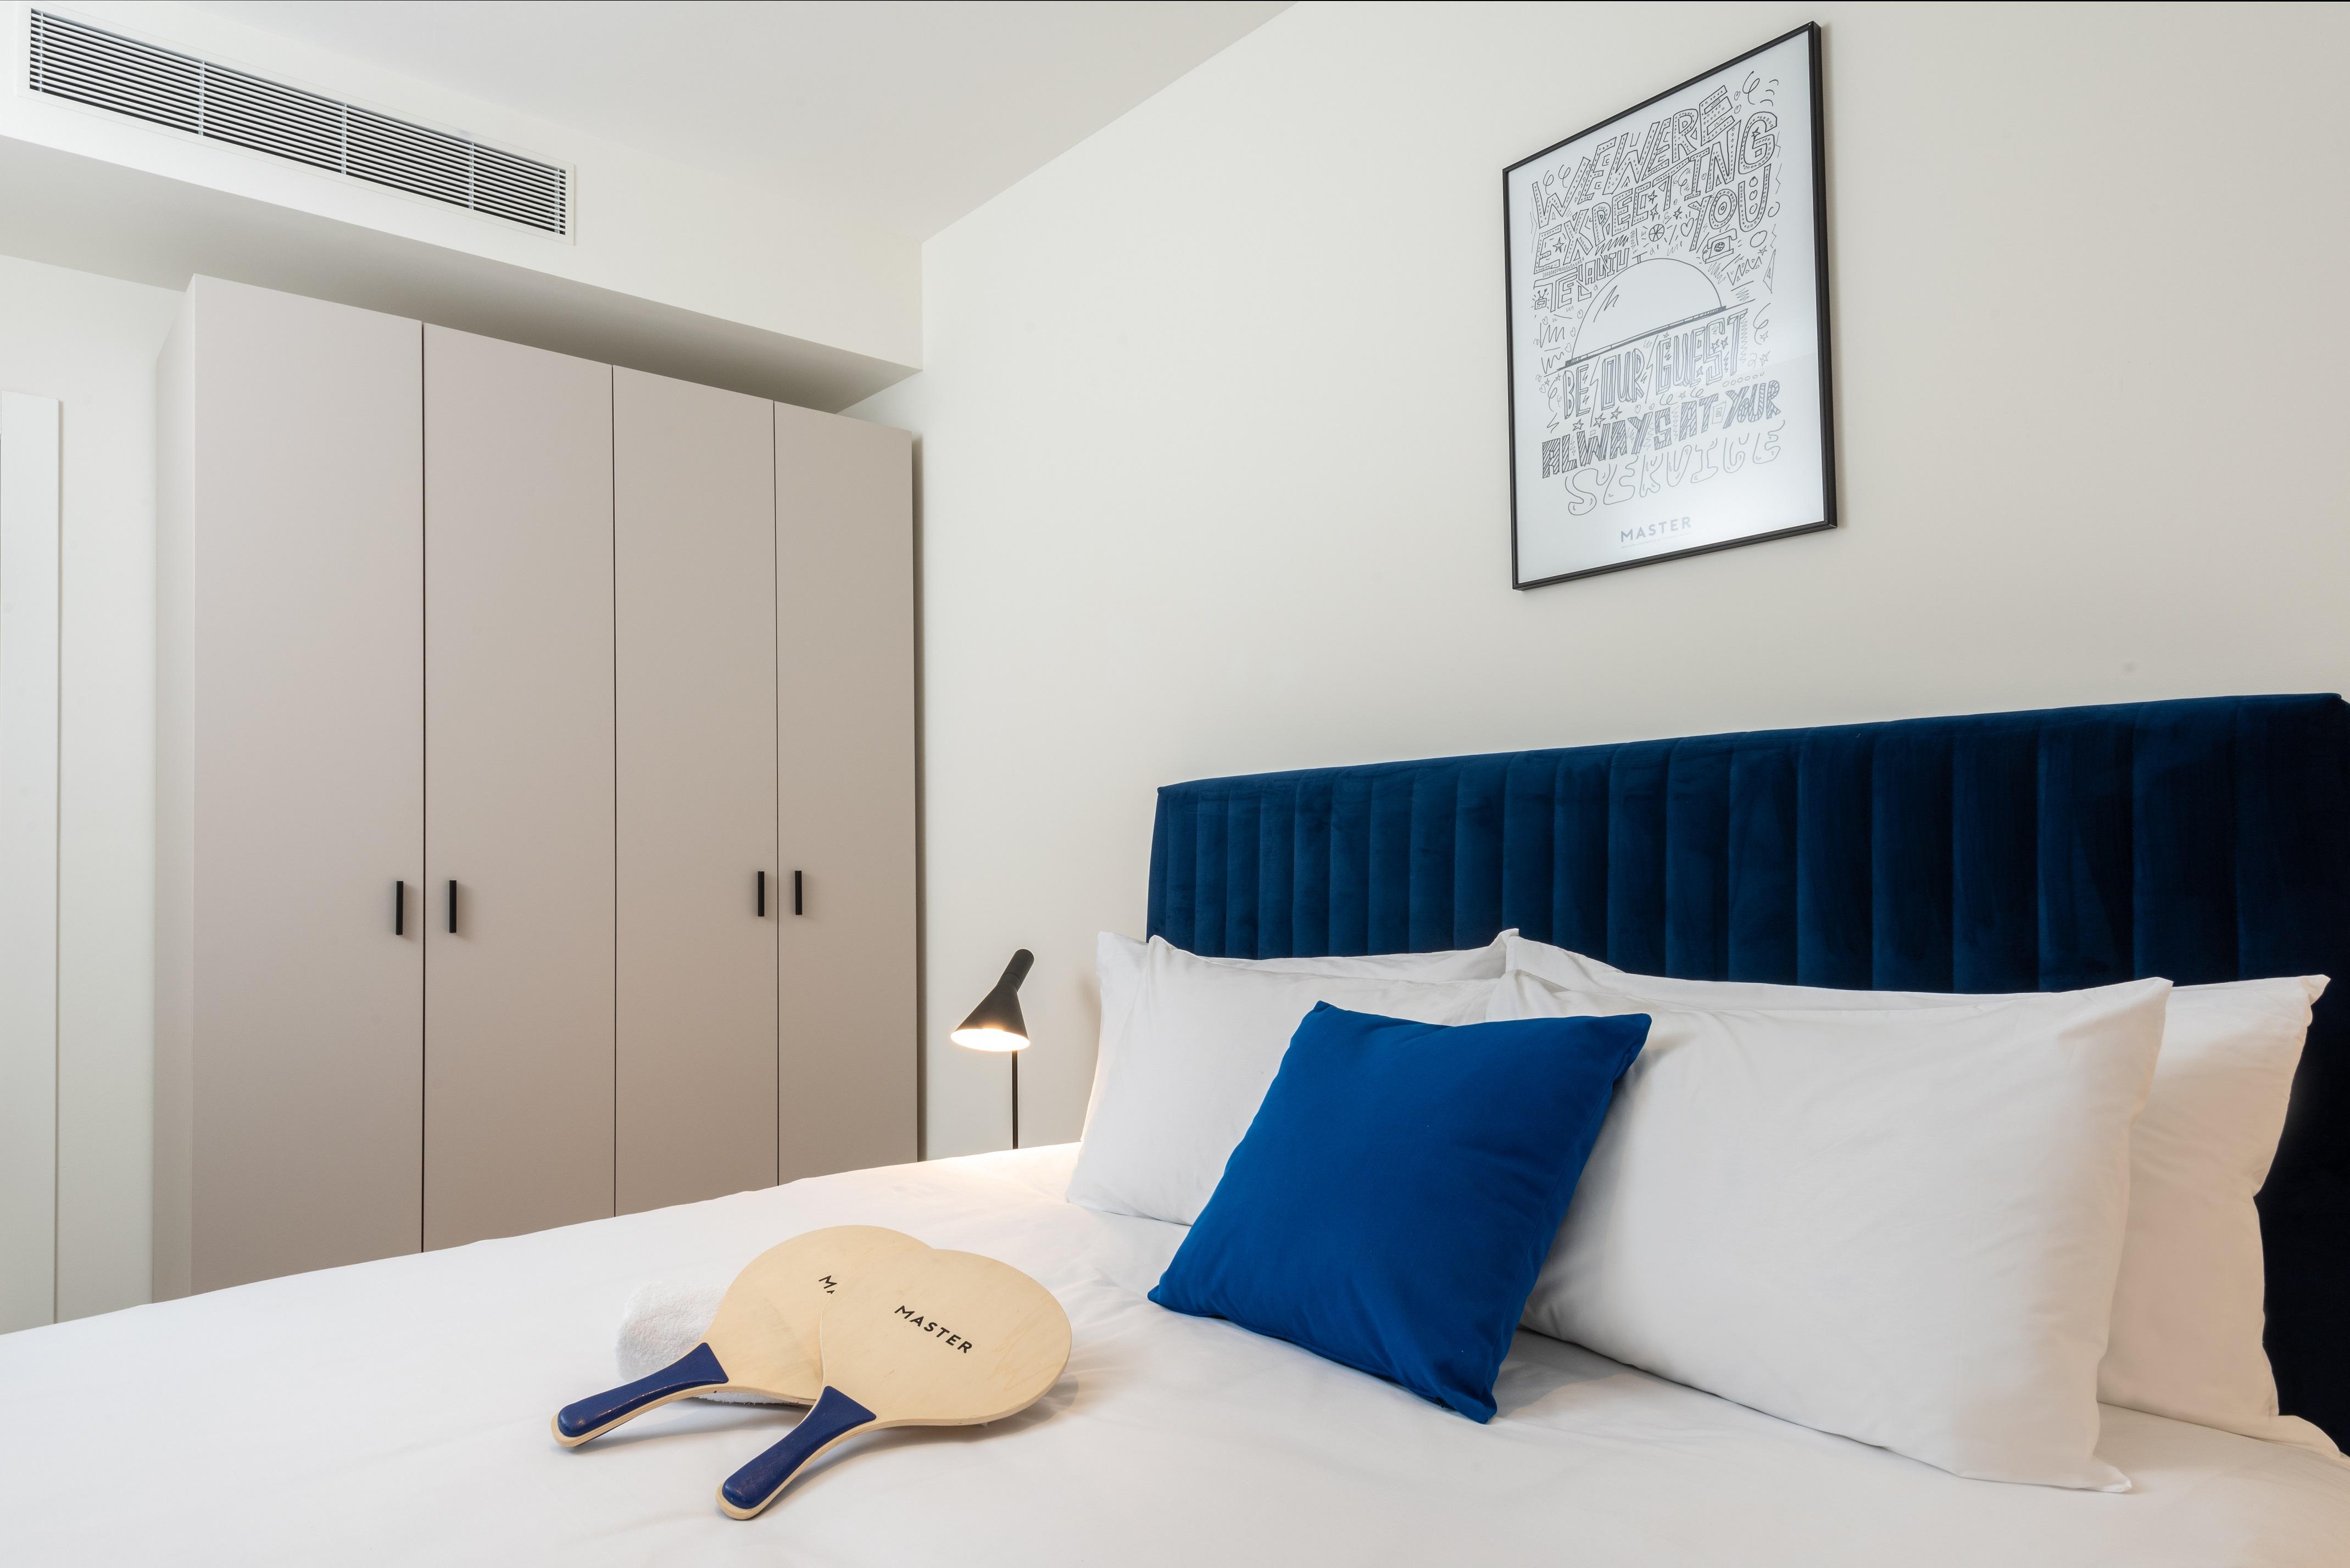 One Bedroom Apartment no Balcony photo 20622564